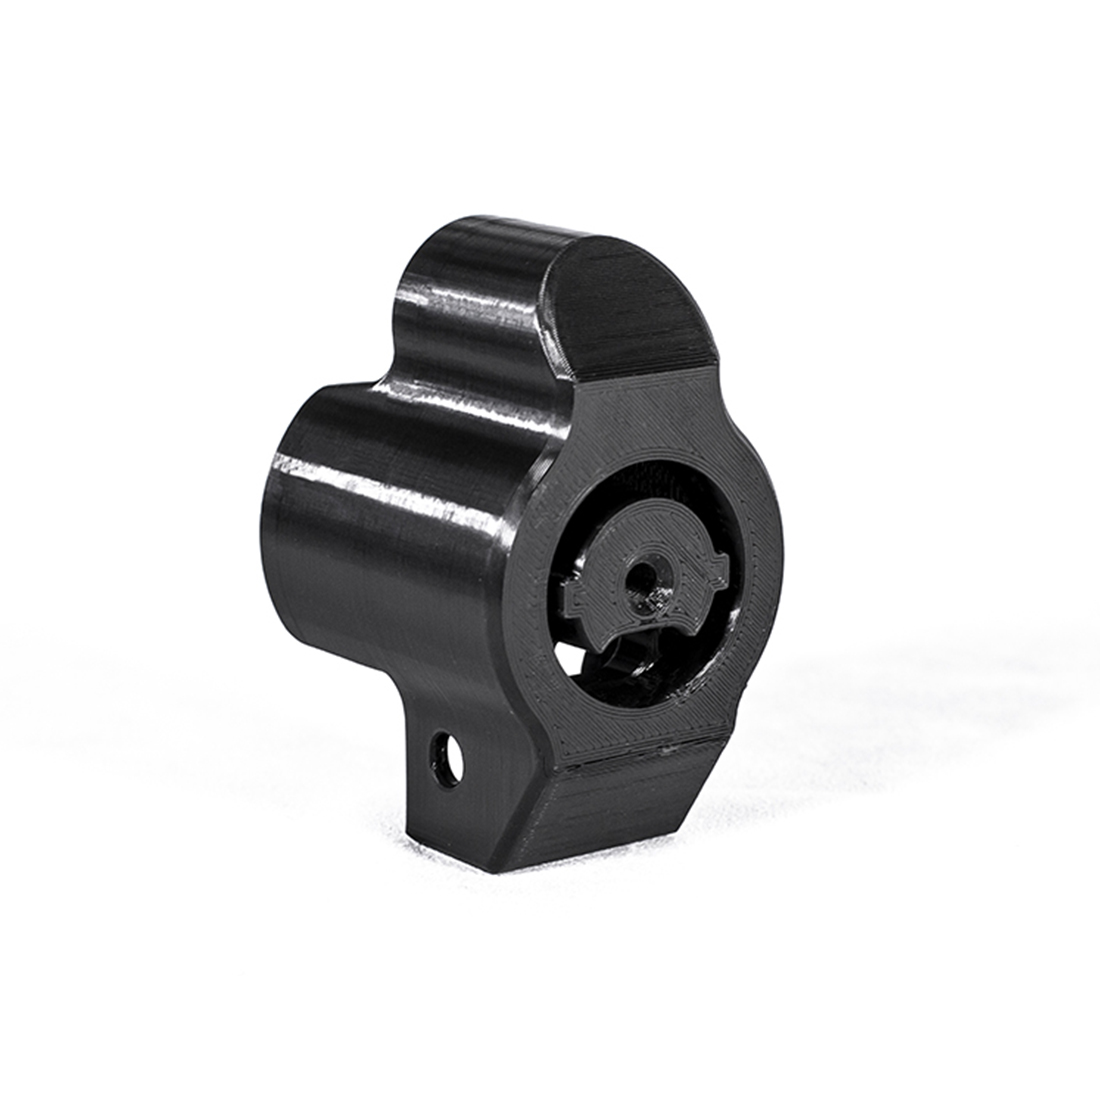 MODIKER 2019 NEW DK Buffer Tube Adapter Connector for HQ MP5K Water Gel Beads Blaster - BlackOutdoor Fun & Sports